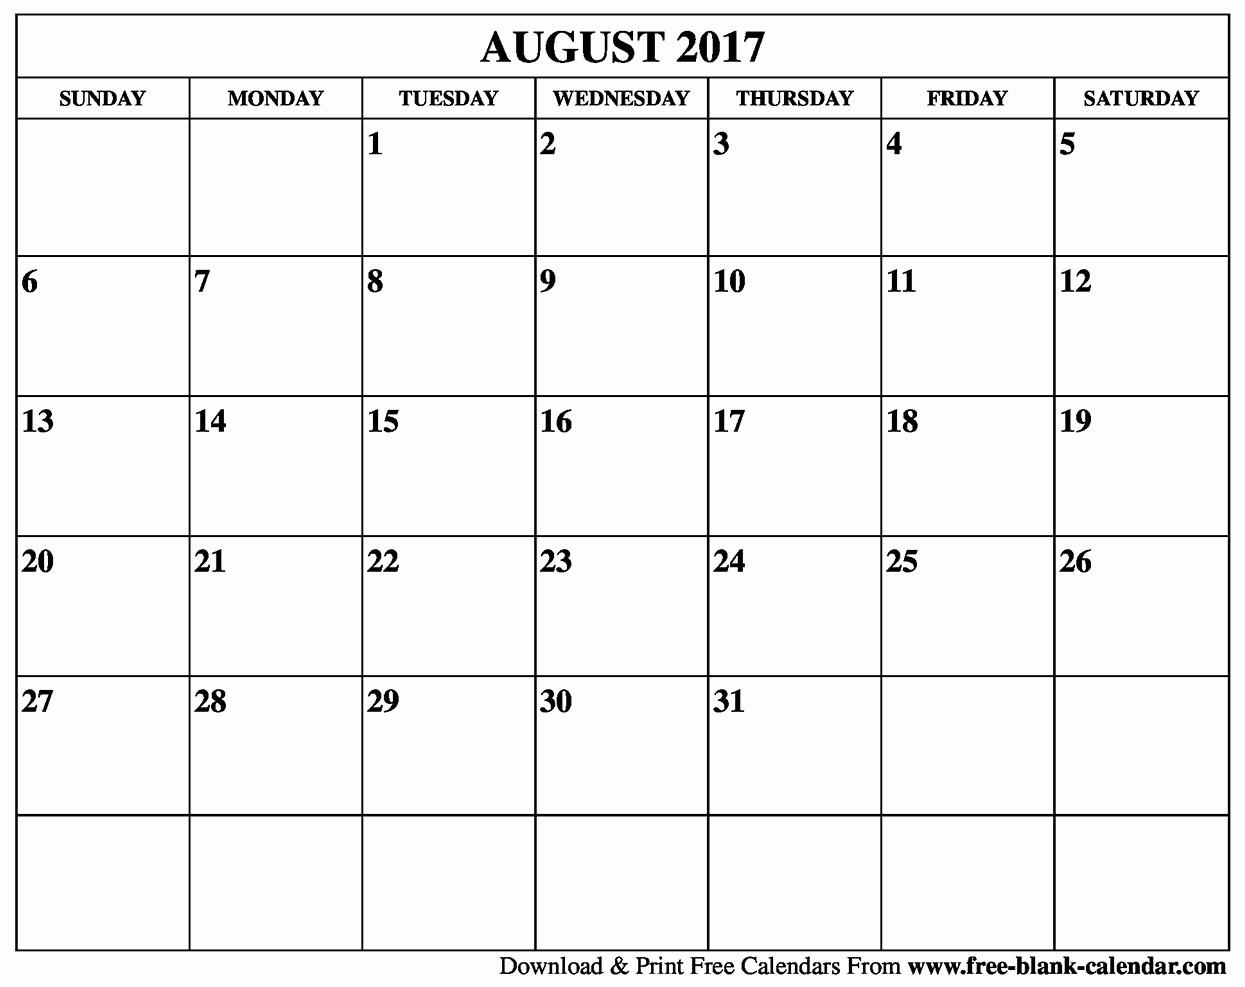 Blank Calendar Template August 2017 Inspirational Blank August 2017 Calendar Printable